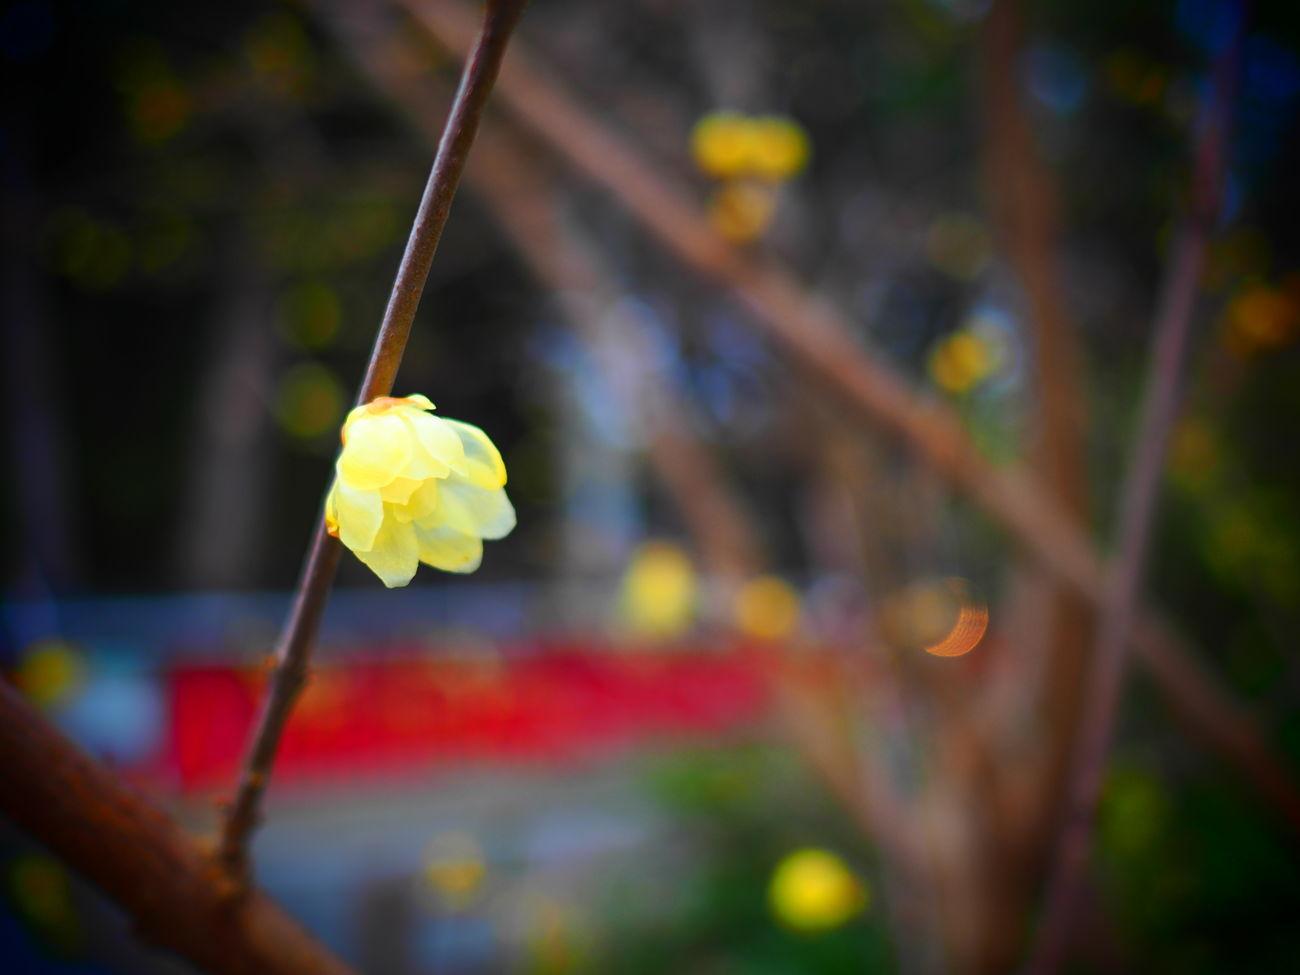 EyeEmFlower Flower Flower Collection Flowers Goodmorning Goodmorning :) Goodmorning EyeEm  Goodmorning ♥ GoodMorning⛅ Hello Hello EyeEm Hello World Hello World ✌ Hello ❤ HelloEyeEm Helloworld Yellow Color Yellow Flower Yellow Flowers